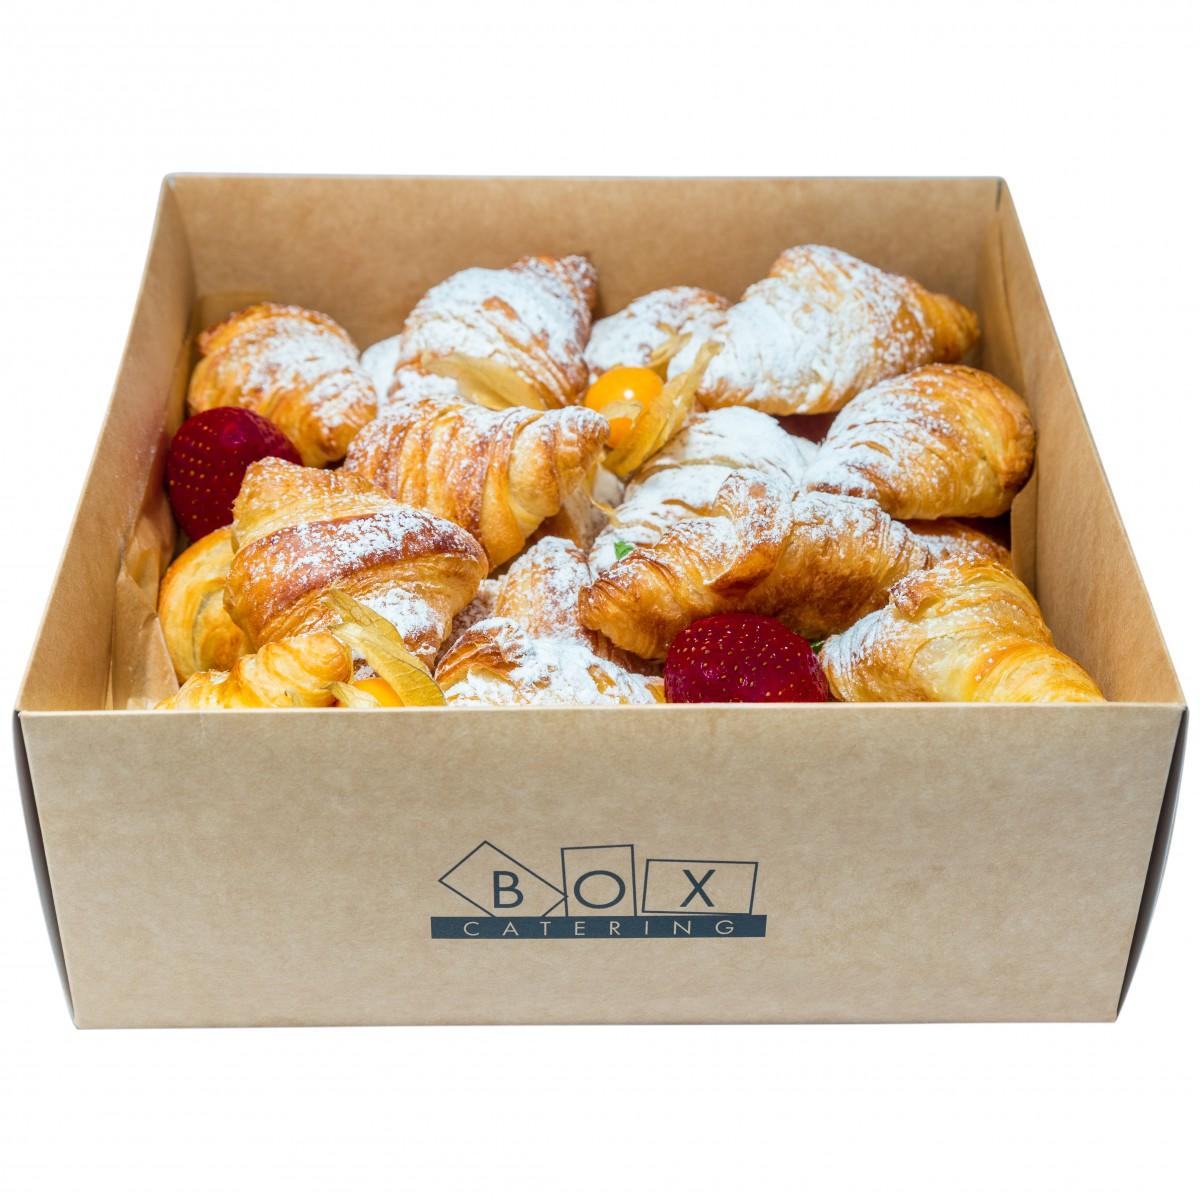 French Croissant box фото 2